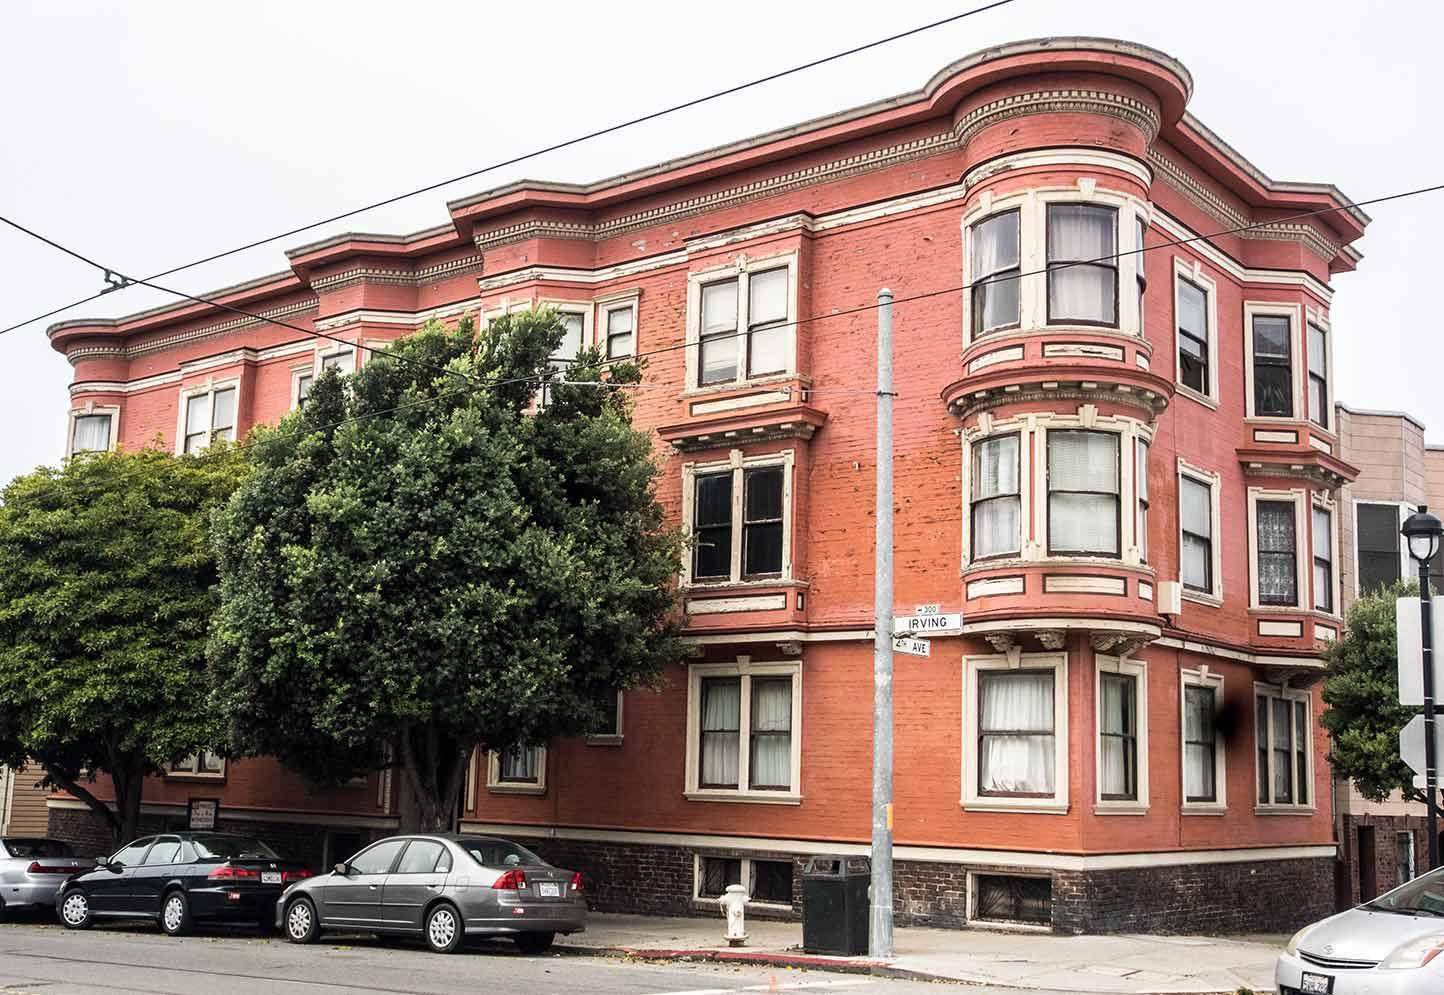 Lloyd S Blog Nice Apartment Building In San Francisco